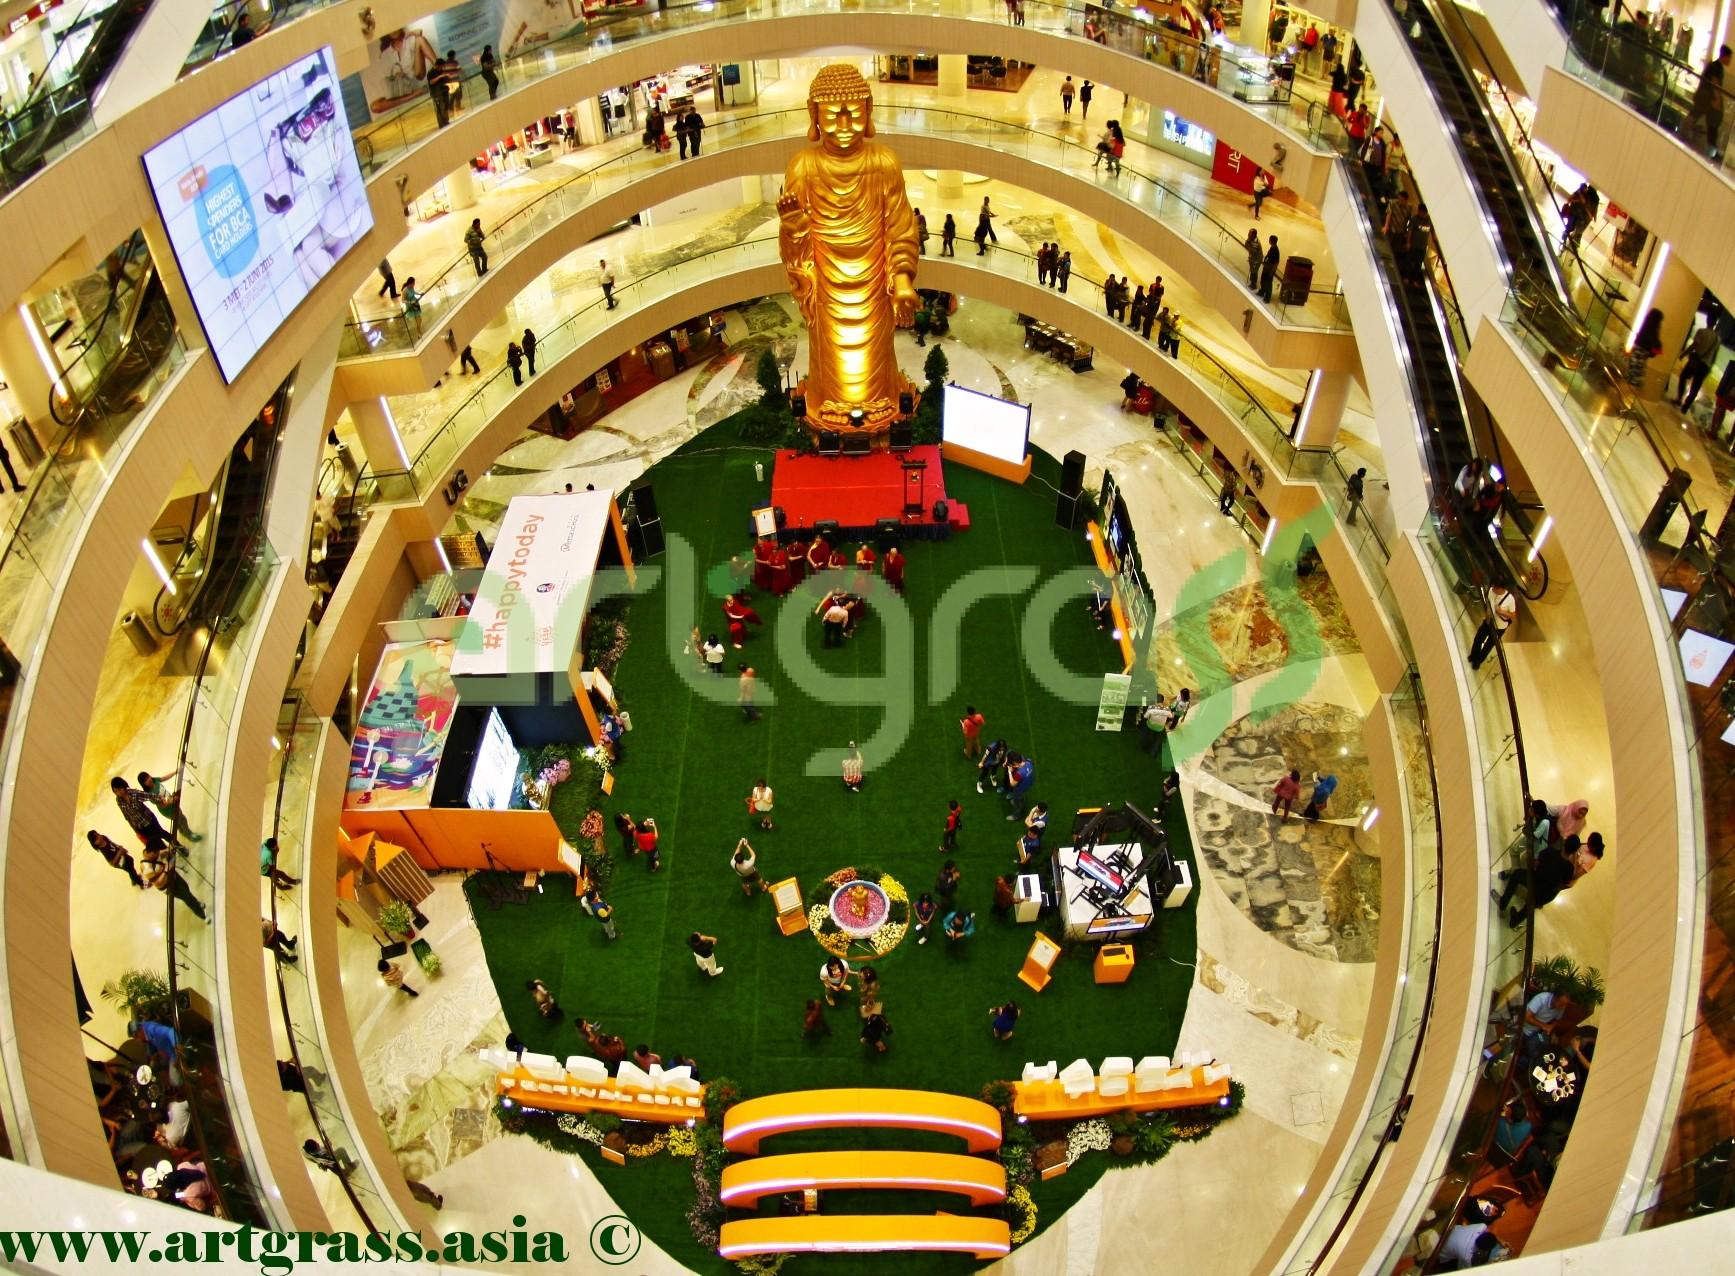 ArtGrass-At-Vesak-Festival-2015-Main-Atrium-Tunjungan-Plaza-28Mei-2015